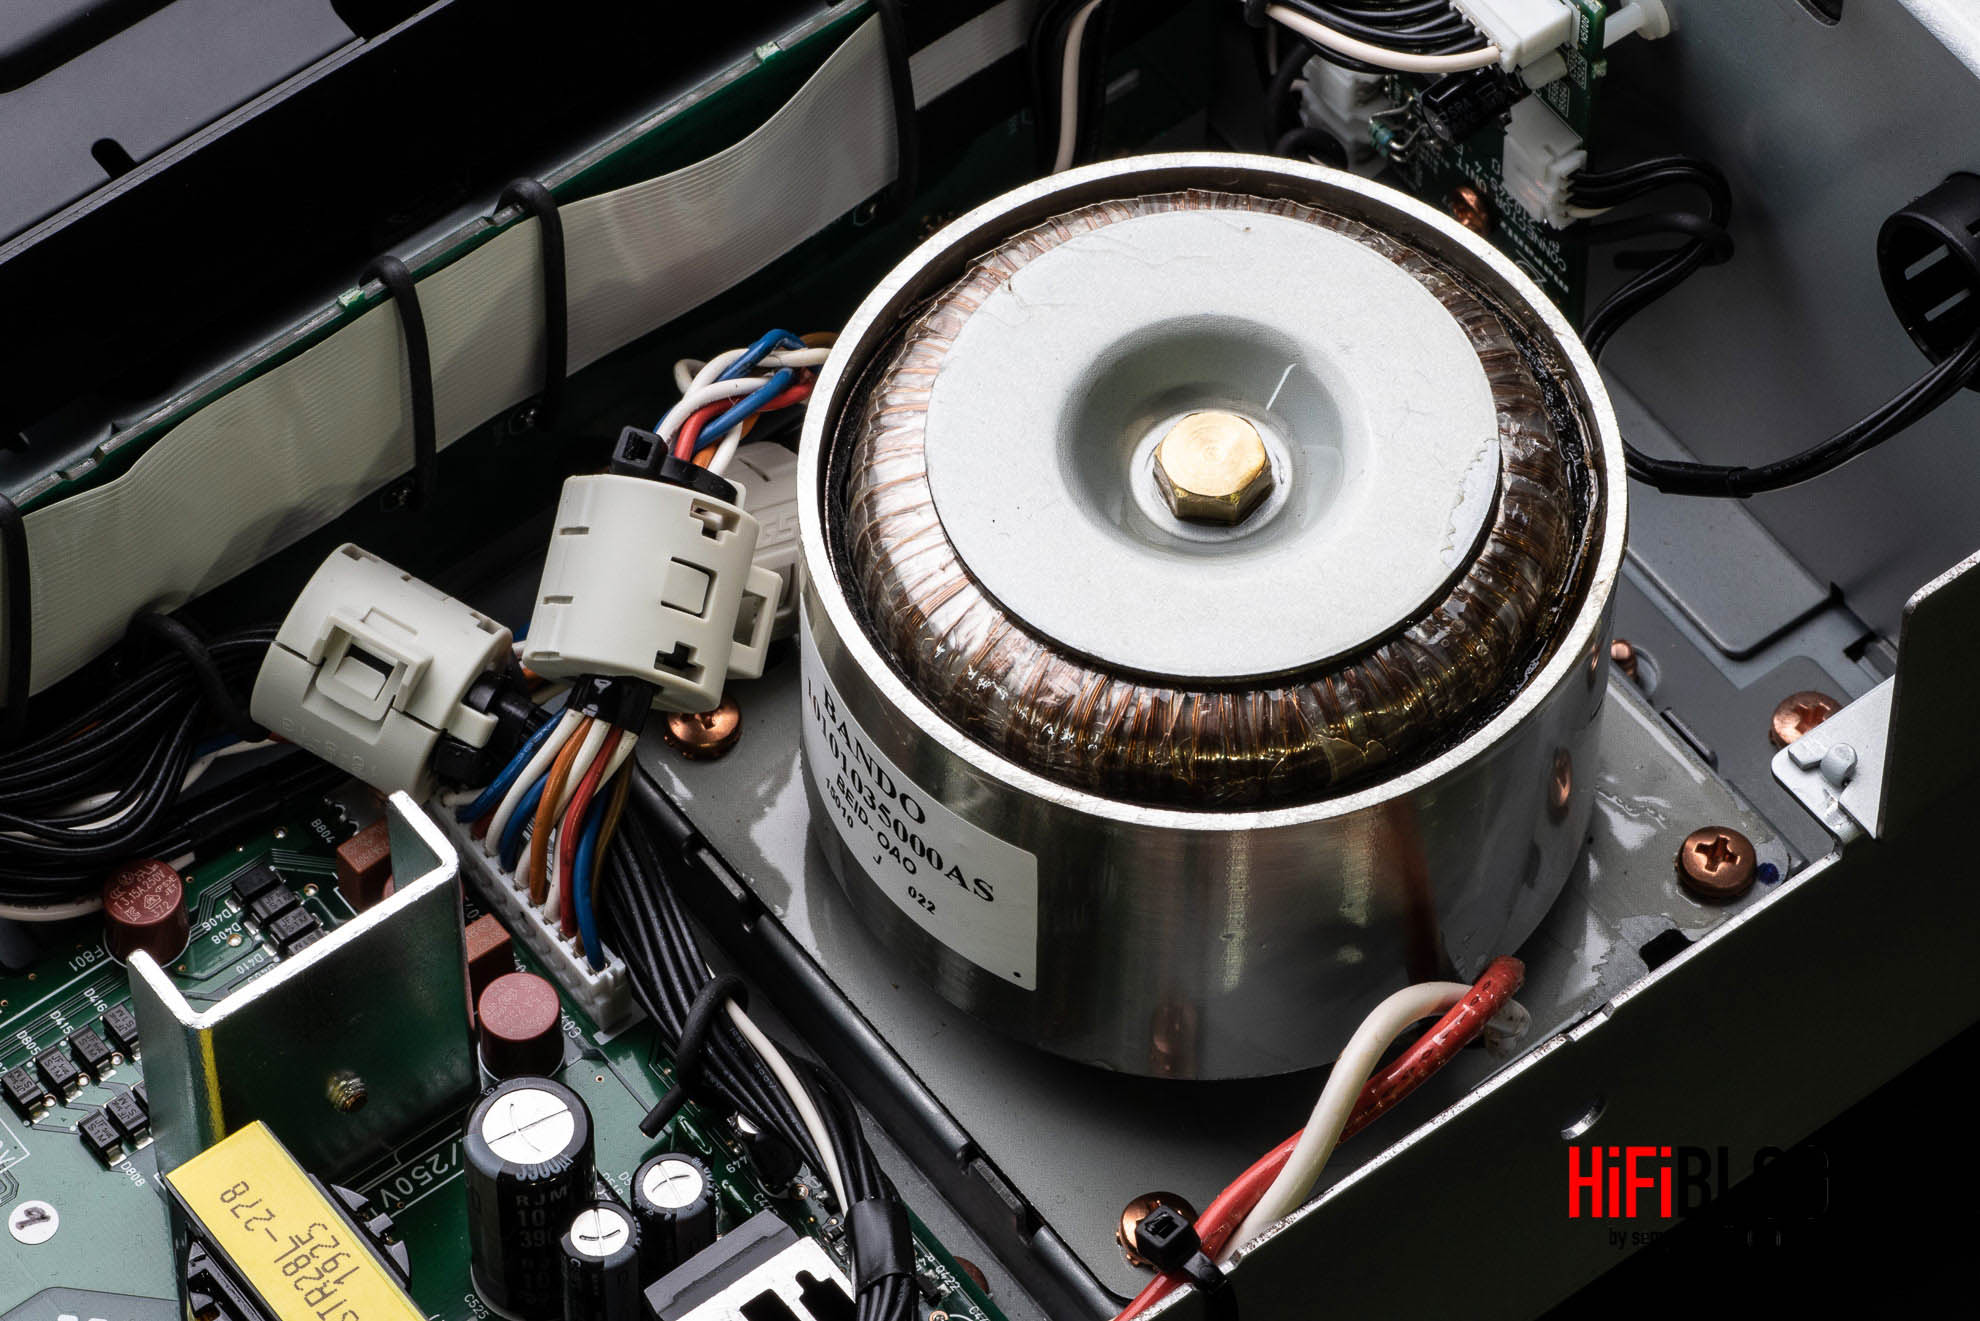 Marantz Model 30 Integrated Amplifier and SACD 30n Network SACD Player 59